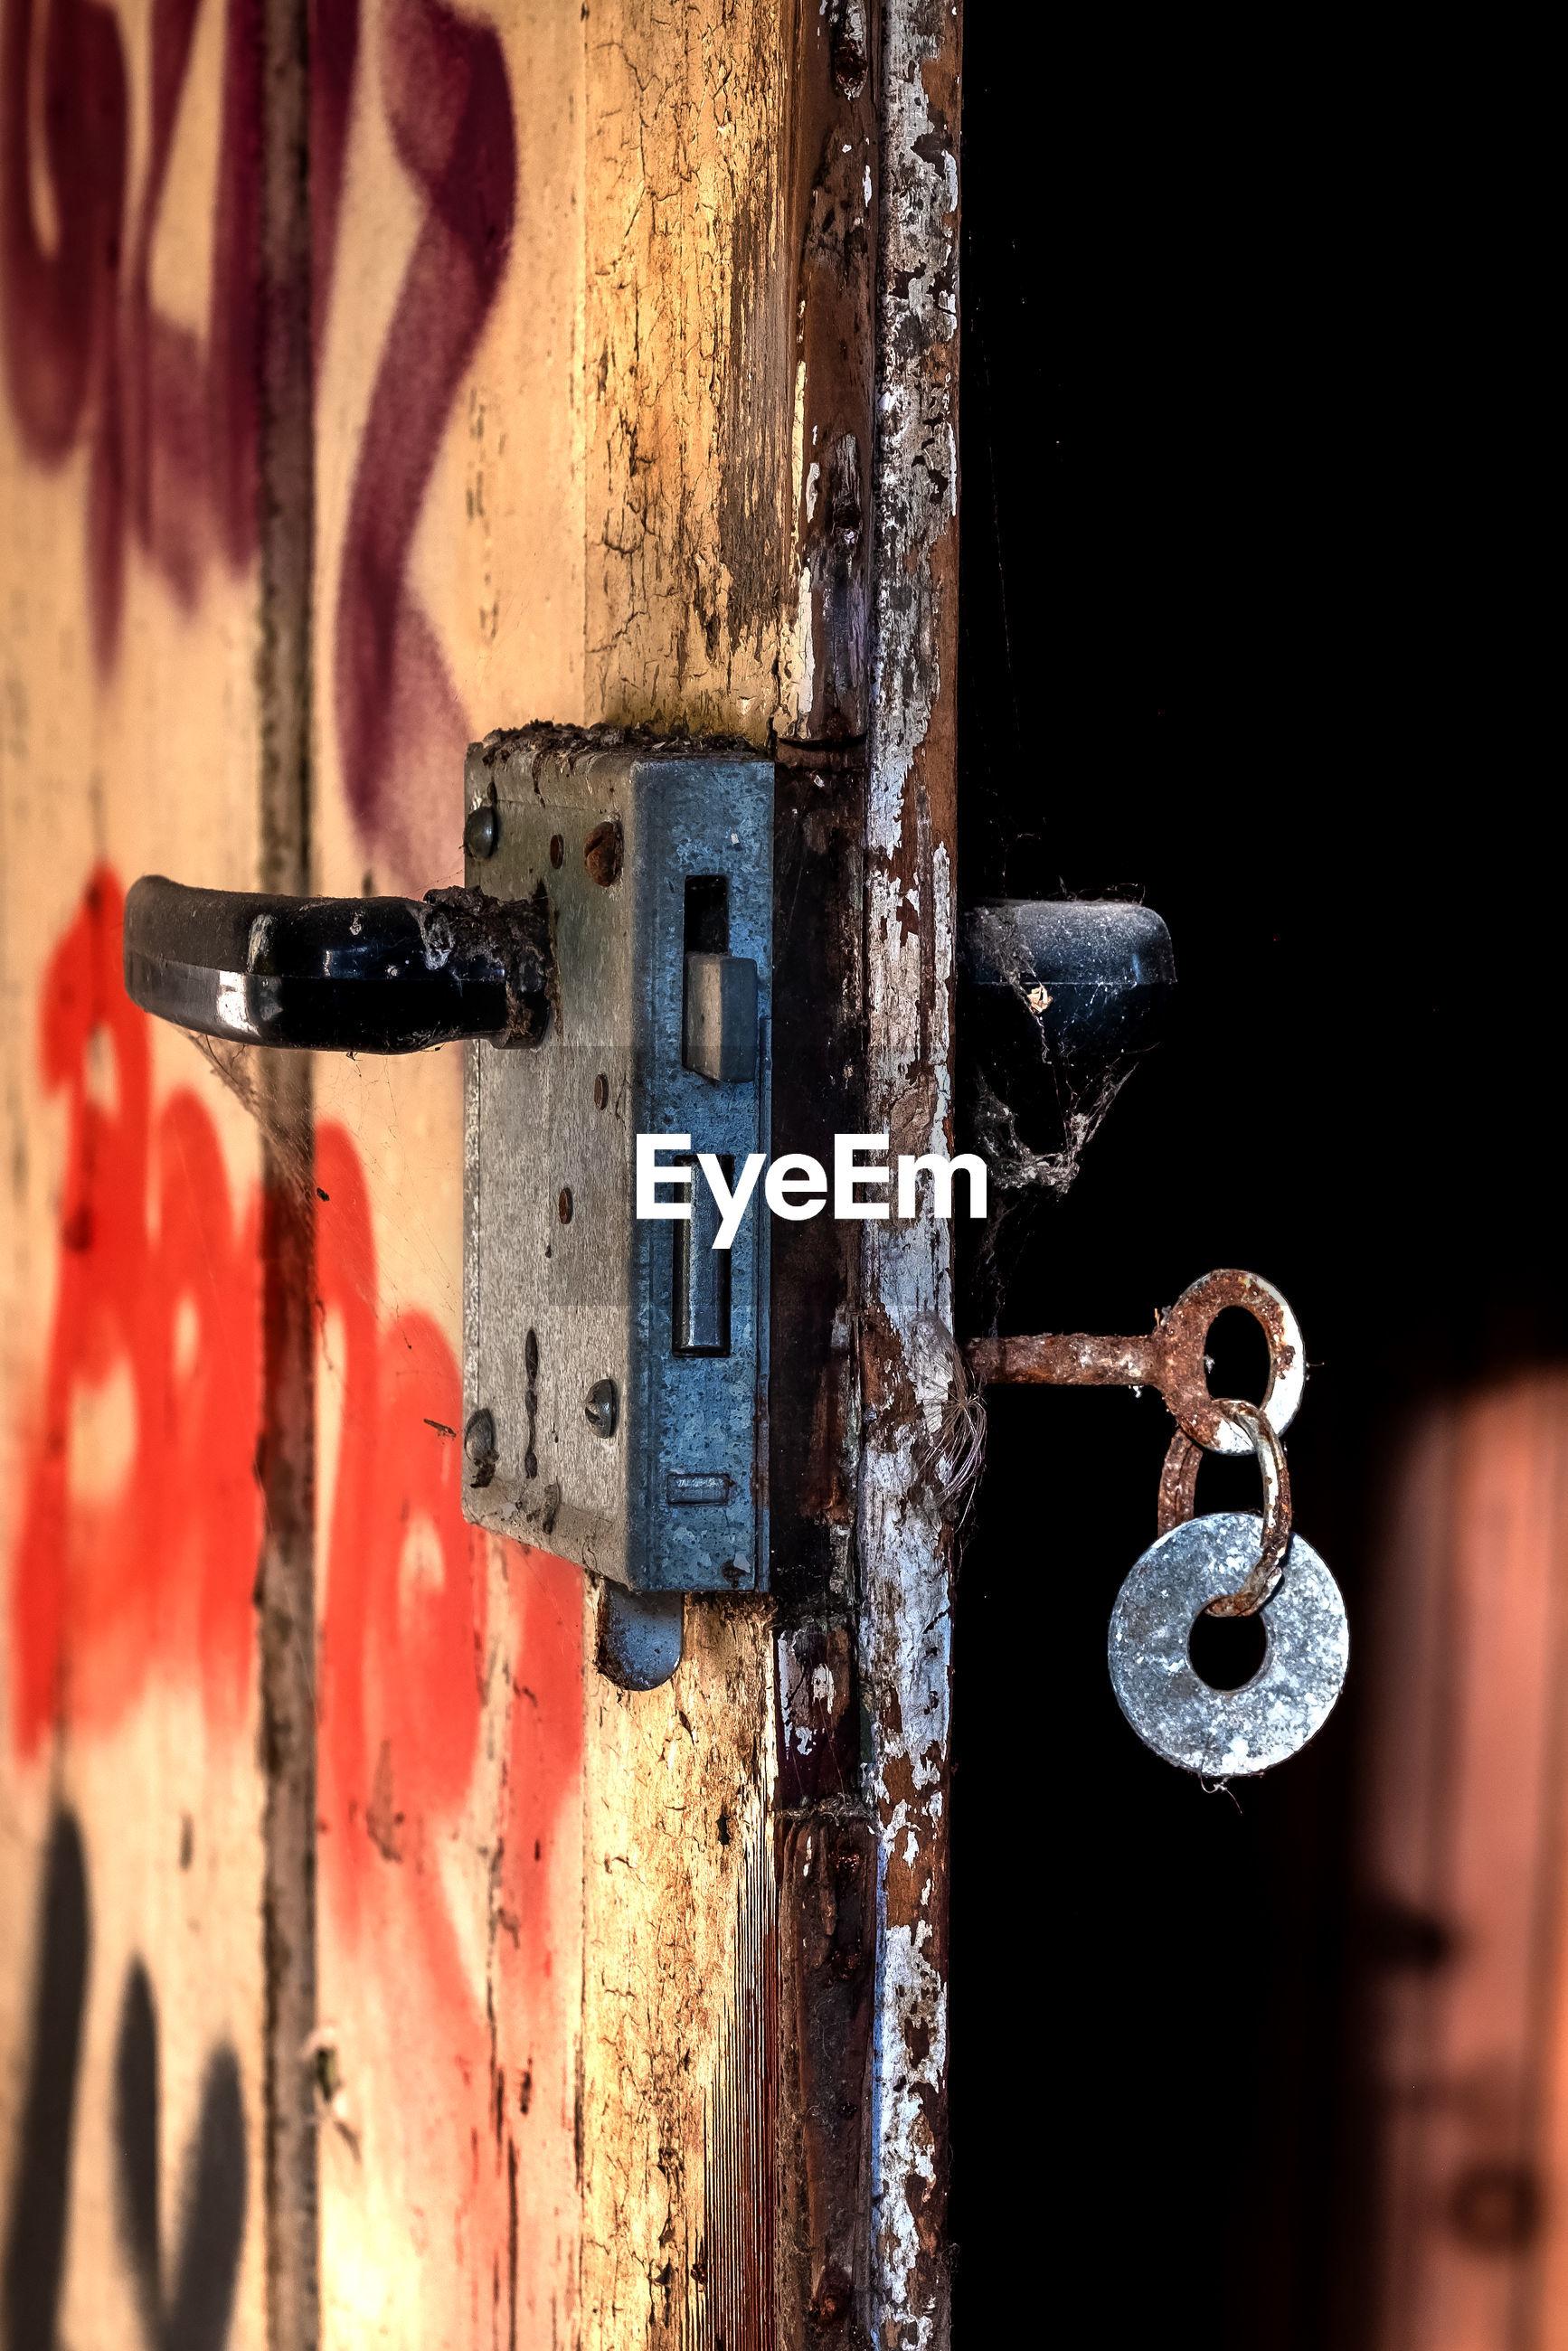 Weathered door with rusty key